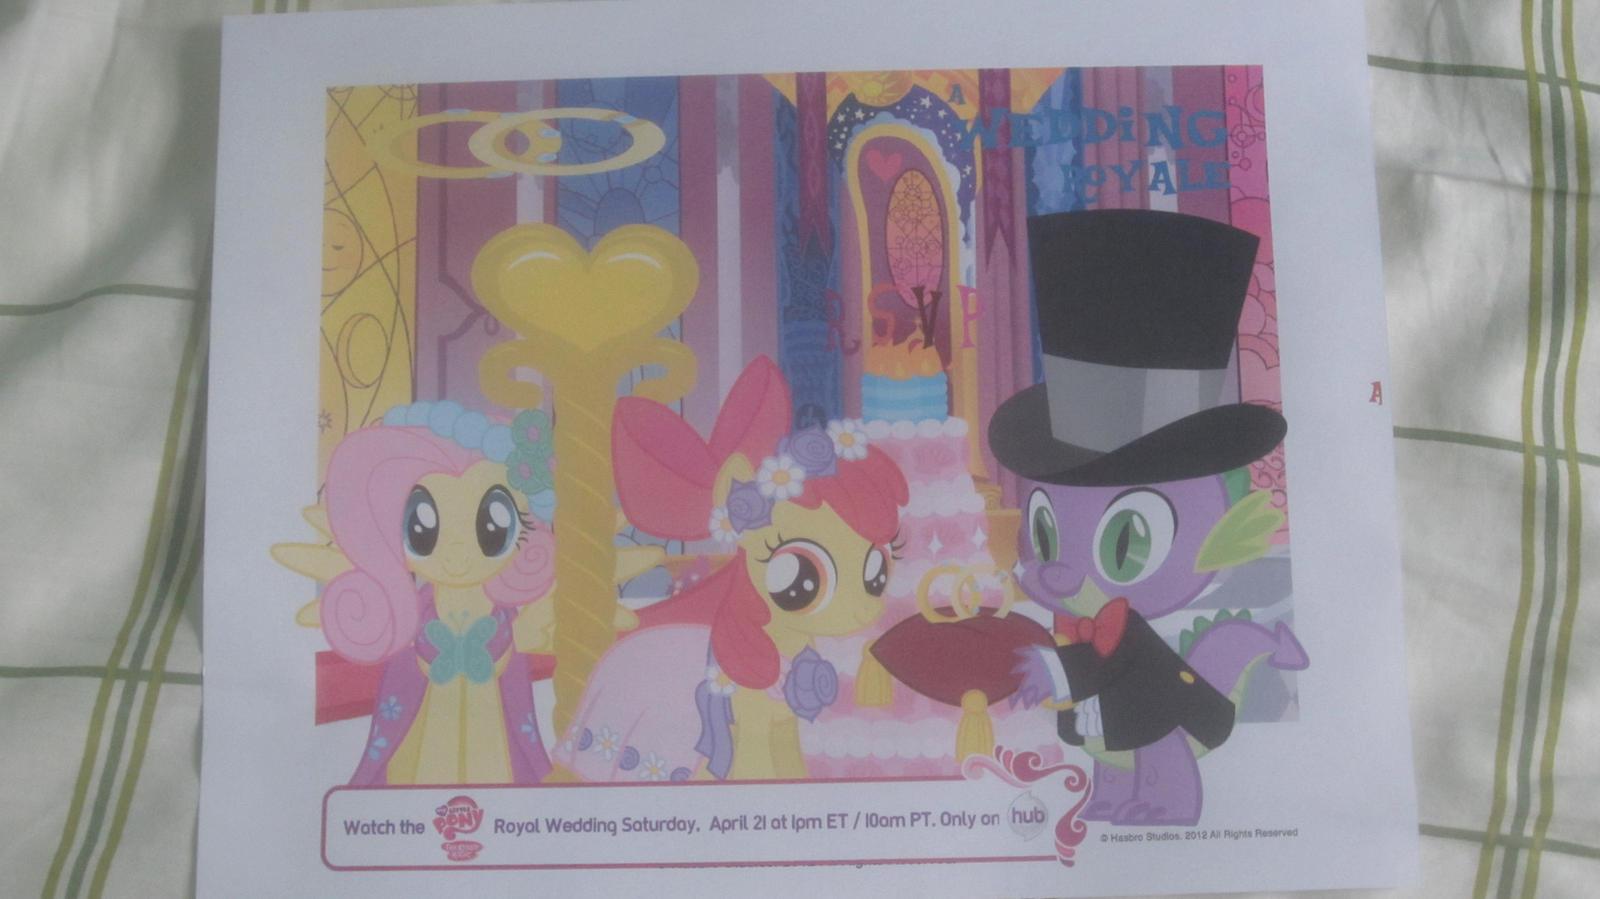 My little pony royal wedding invitation card by MetalGriffen69. My little pony royal wedding invitation card by MetalGriffen69 on